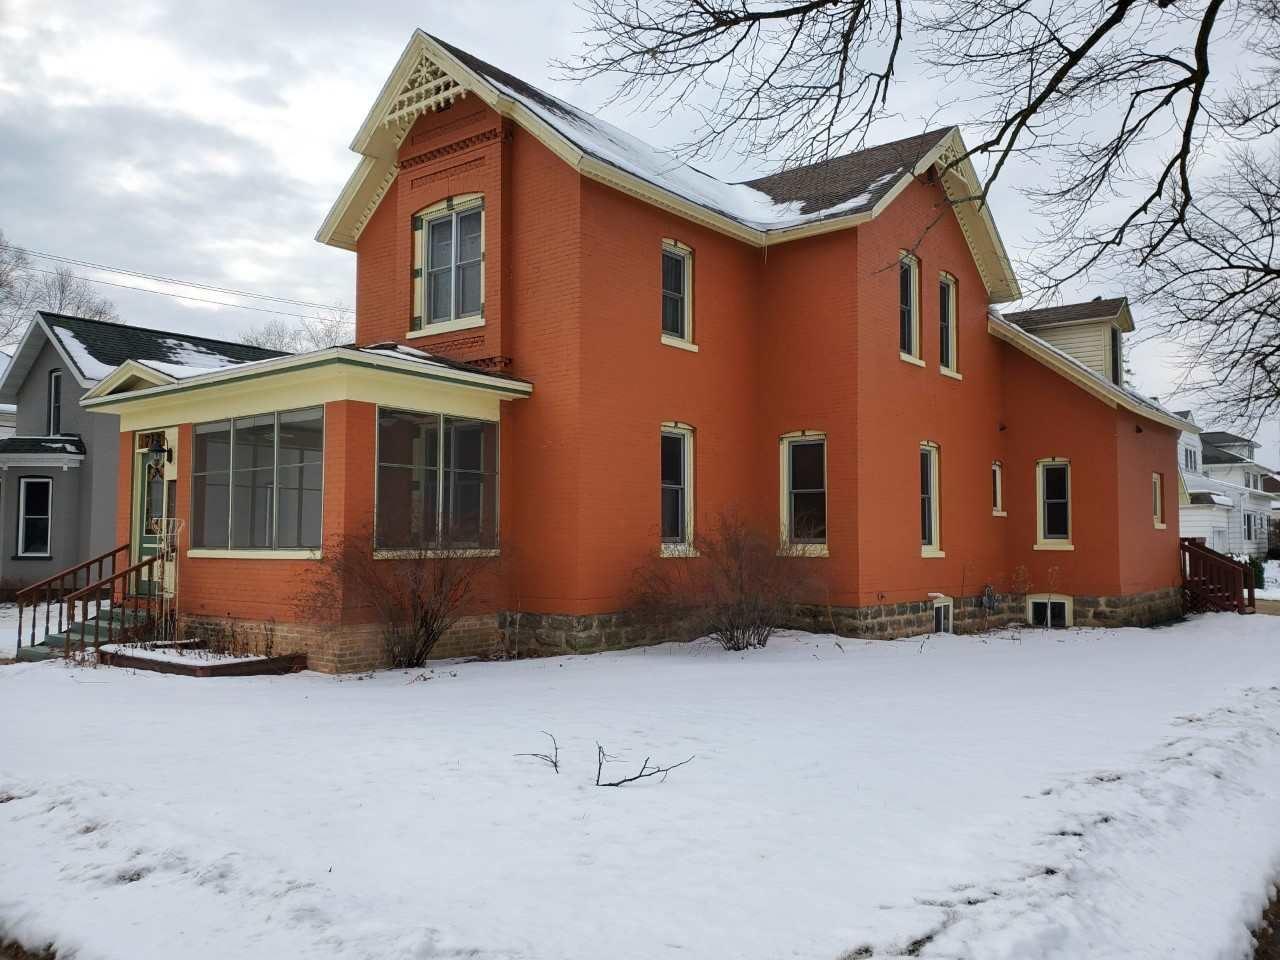 714 Cass St, Portage, WI 53901 - #: 1900586